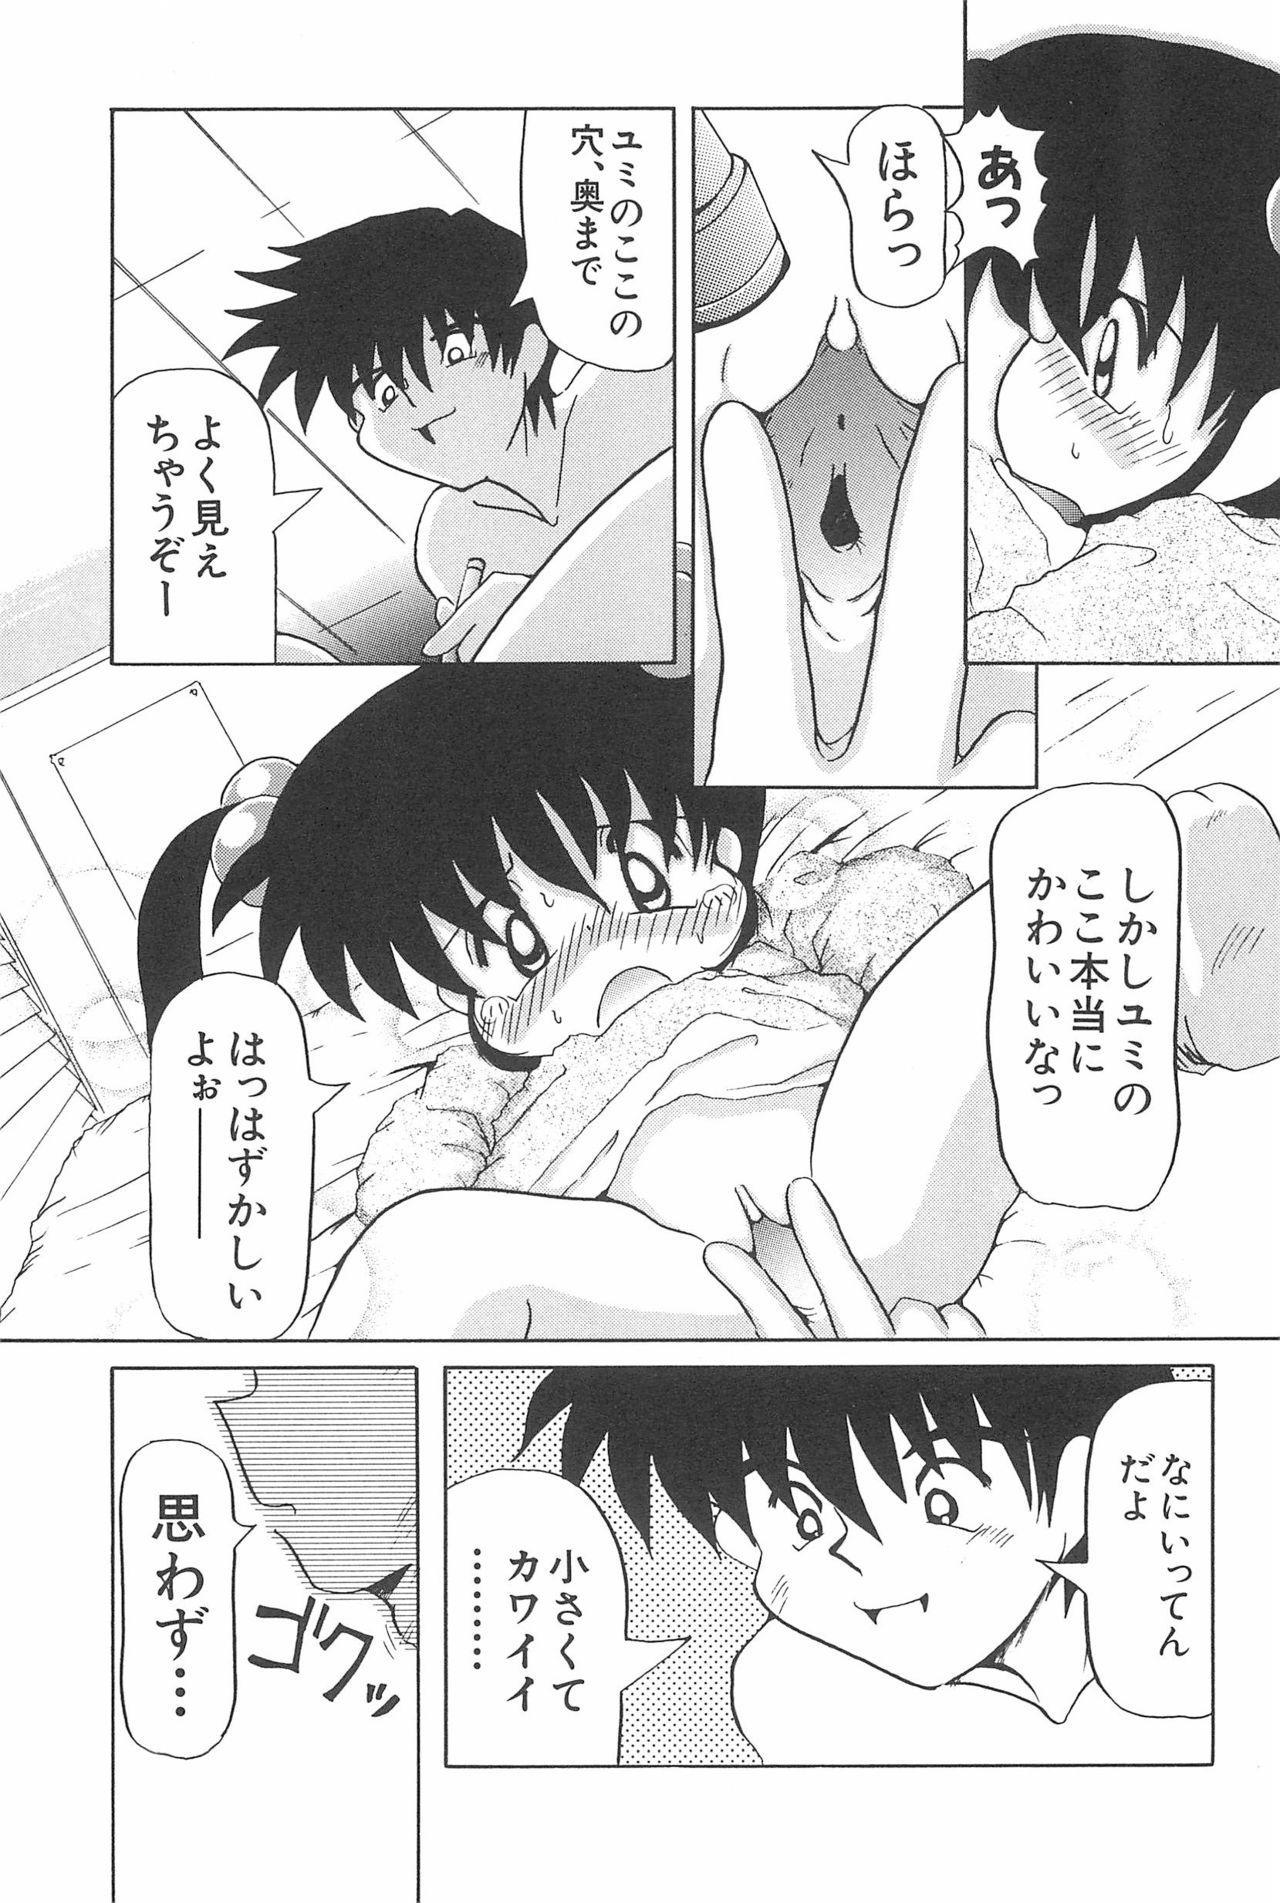 Aoi Shojokyuu 134